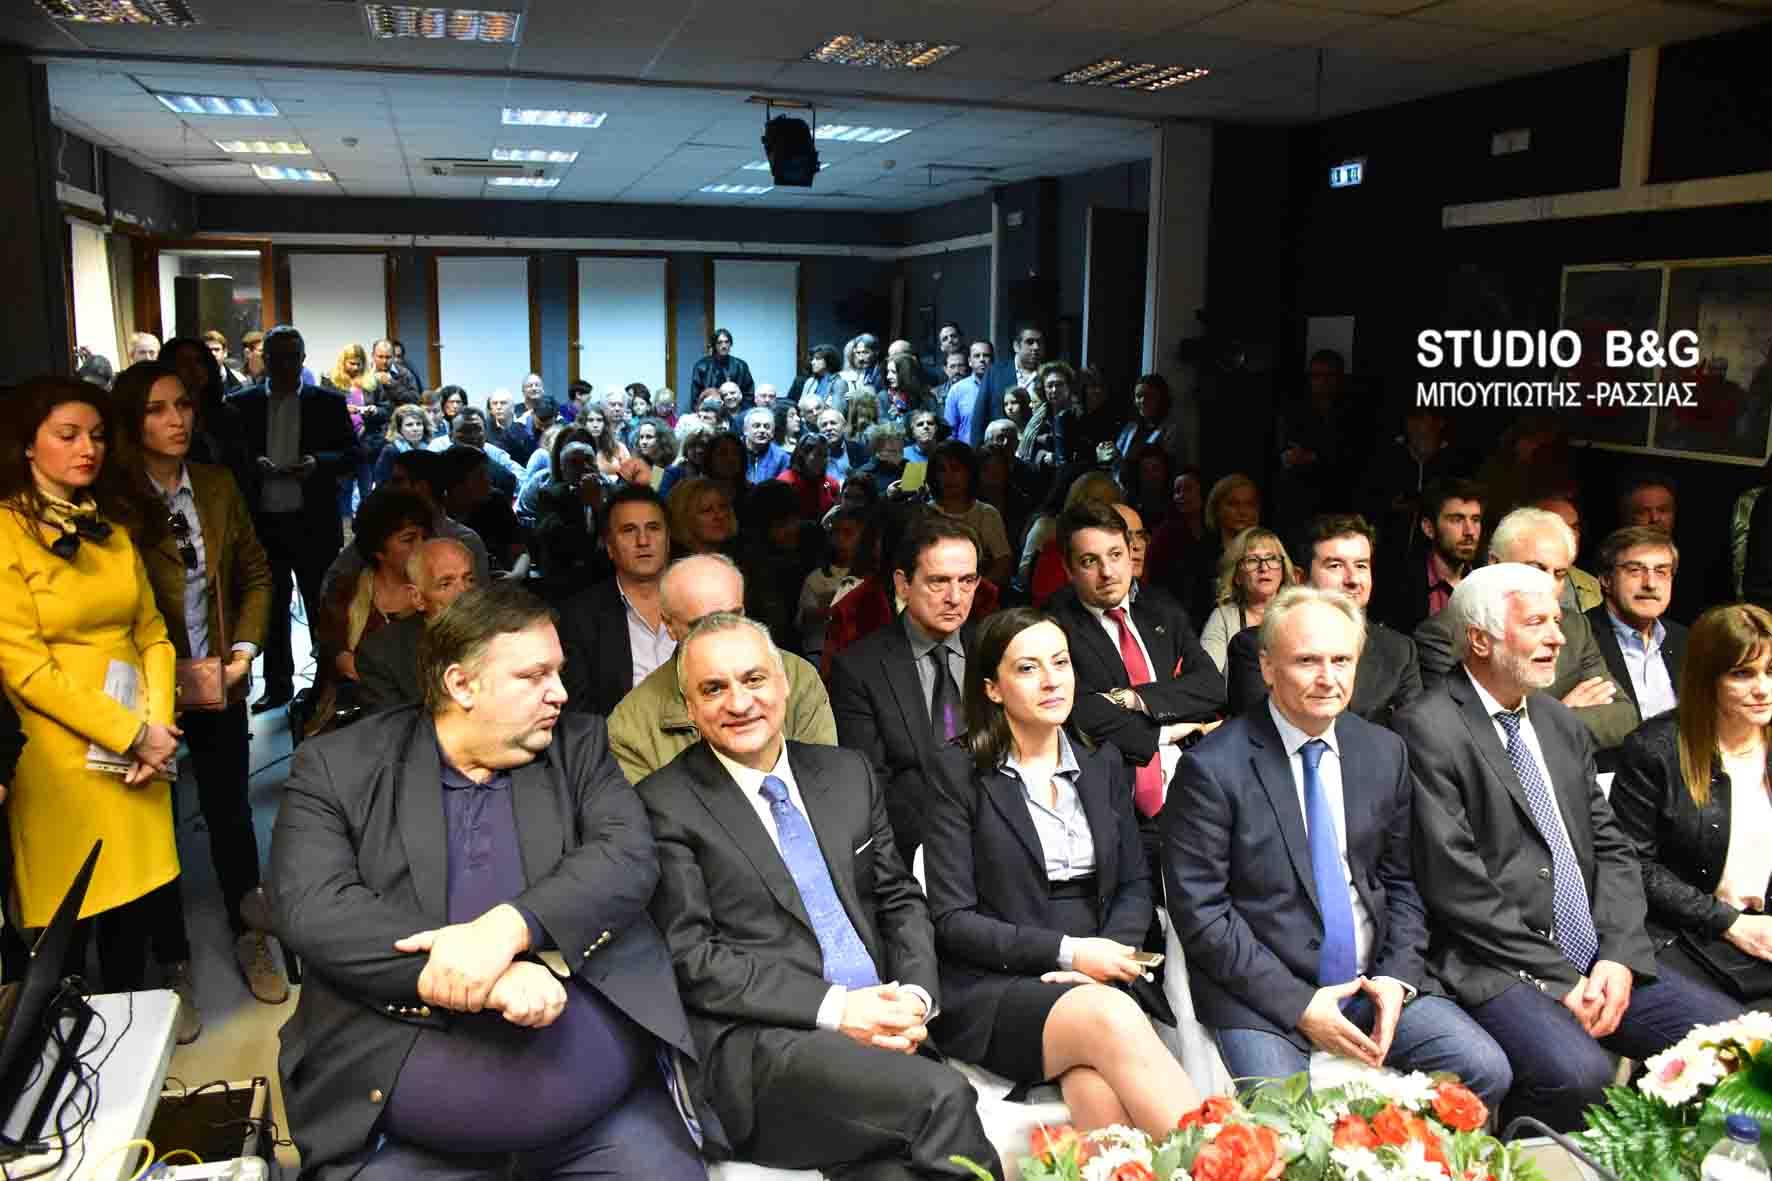 You are currently viewing Ναύπλιο-Εκδήλωση για τα 60 χρόνια της Συνθήκης της Ρώμης με τον Ευρωβουλευτή Μανώλη Κεφαλογιάννη